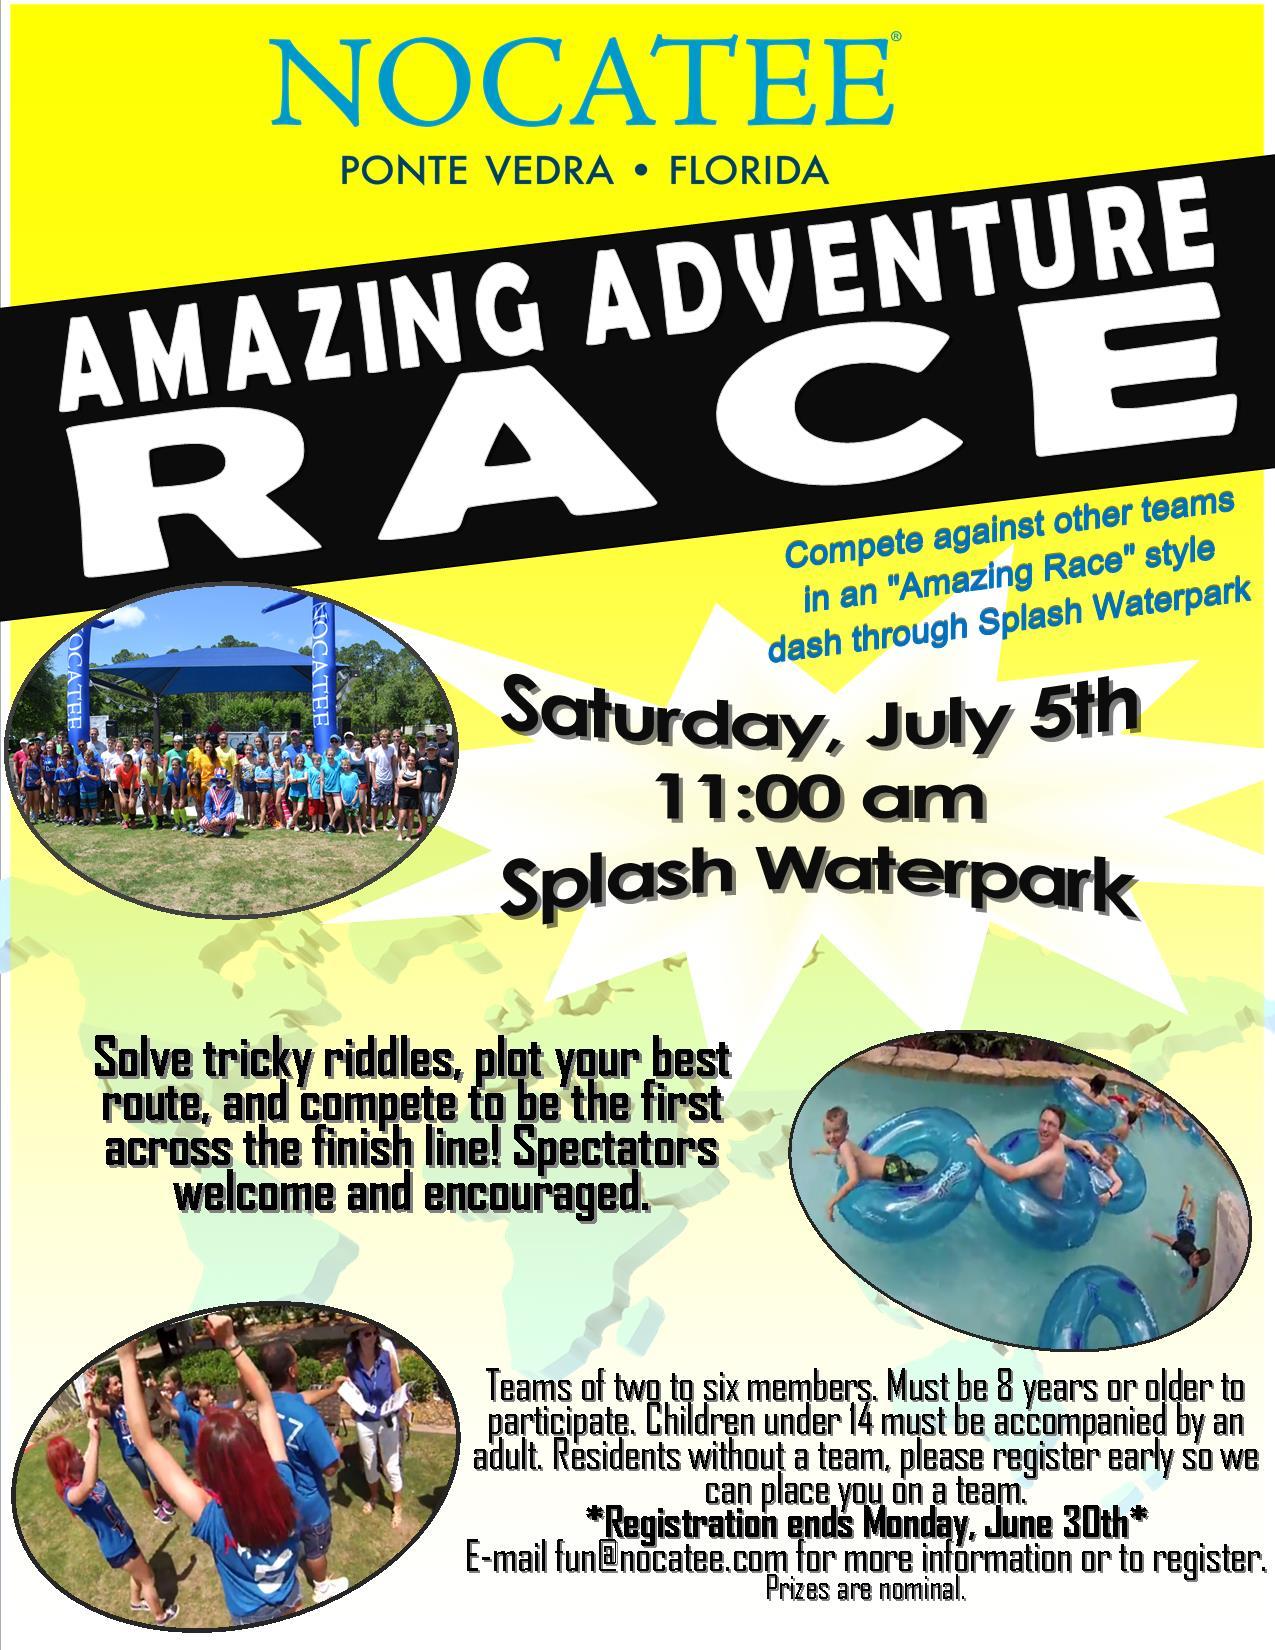 Nocatee Amazing Adventure Race at Splash